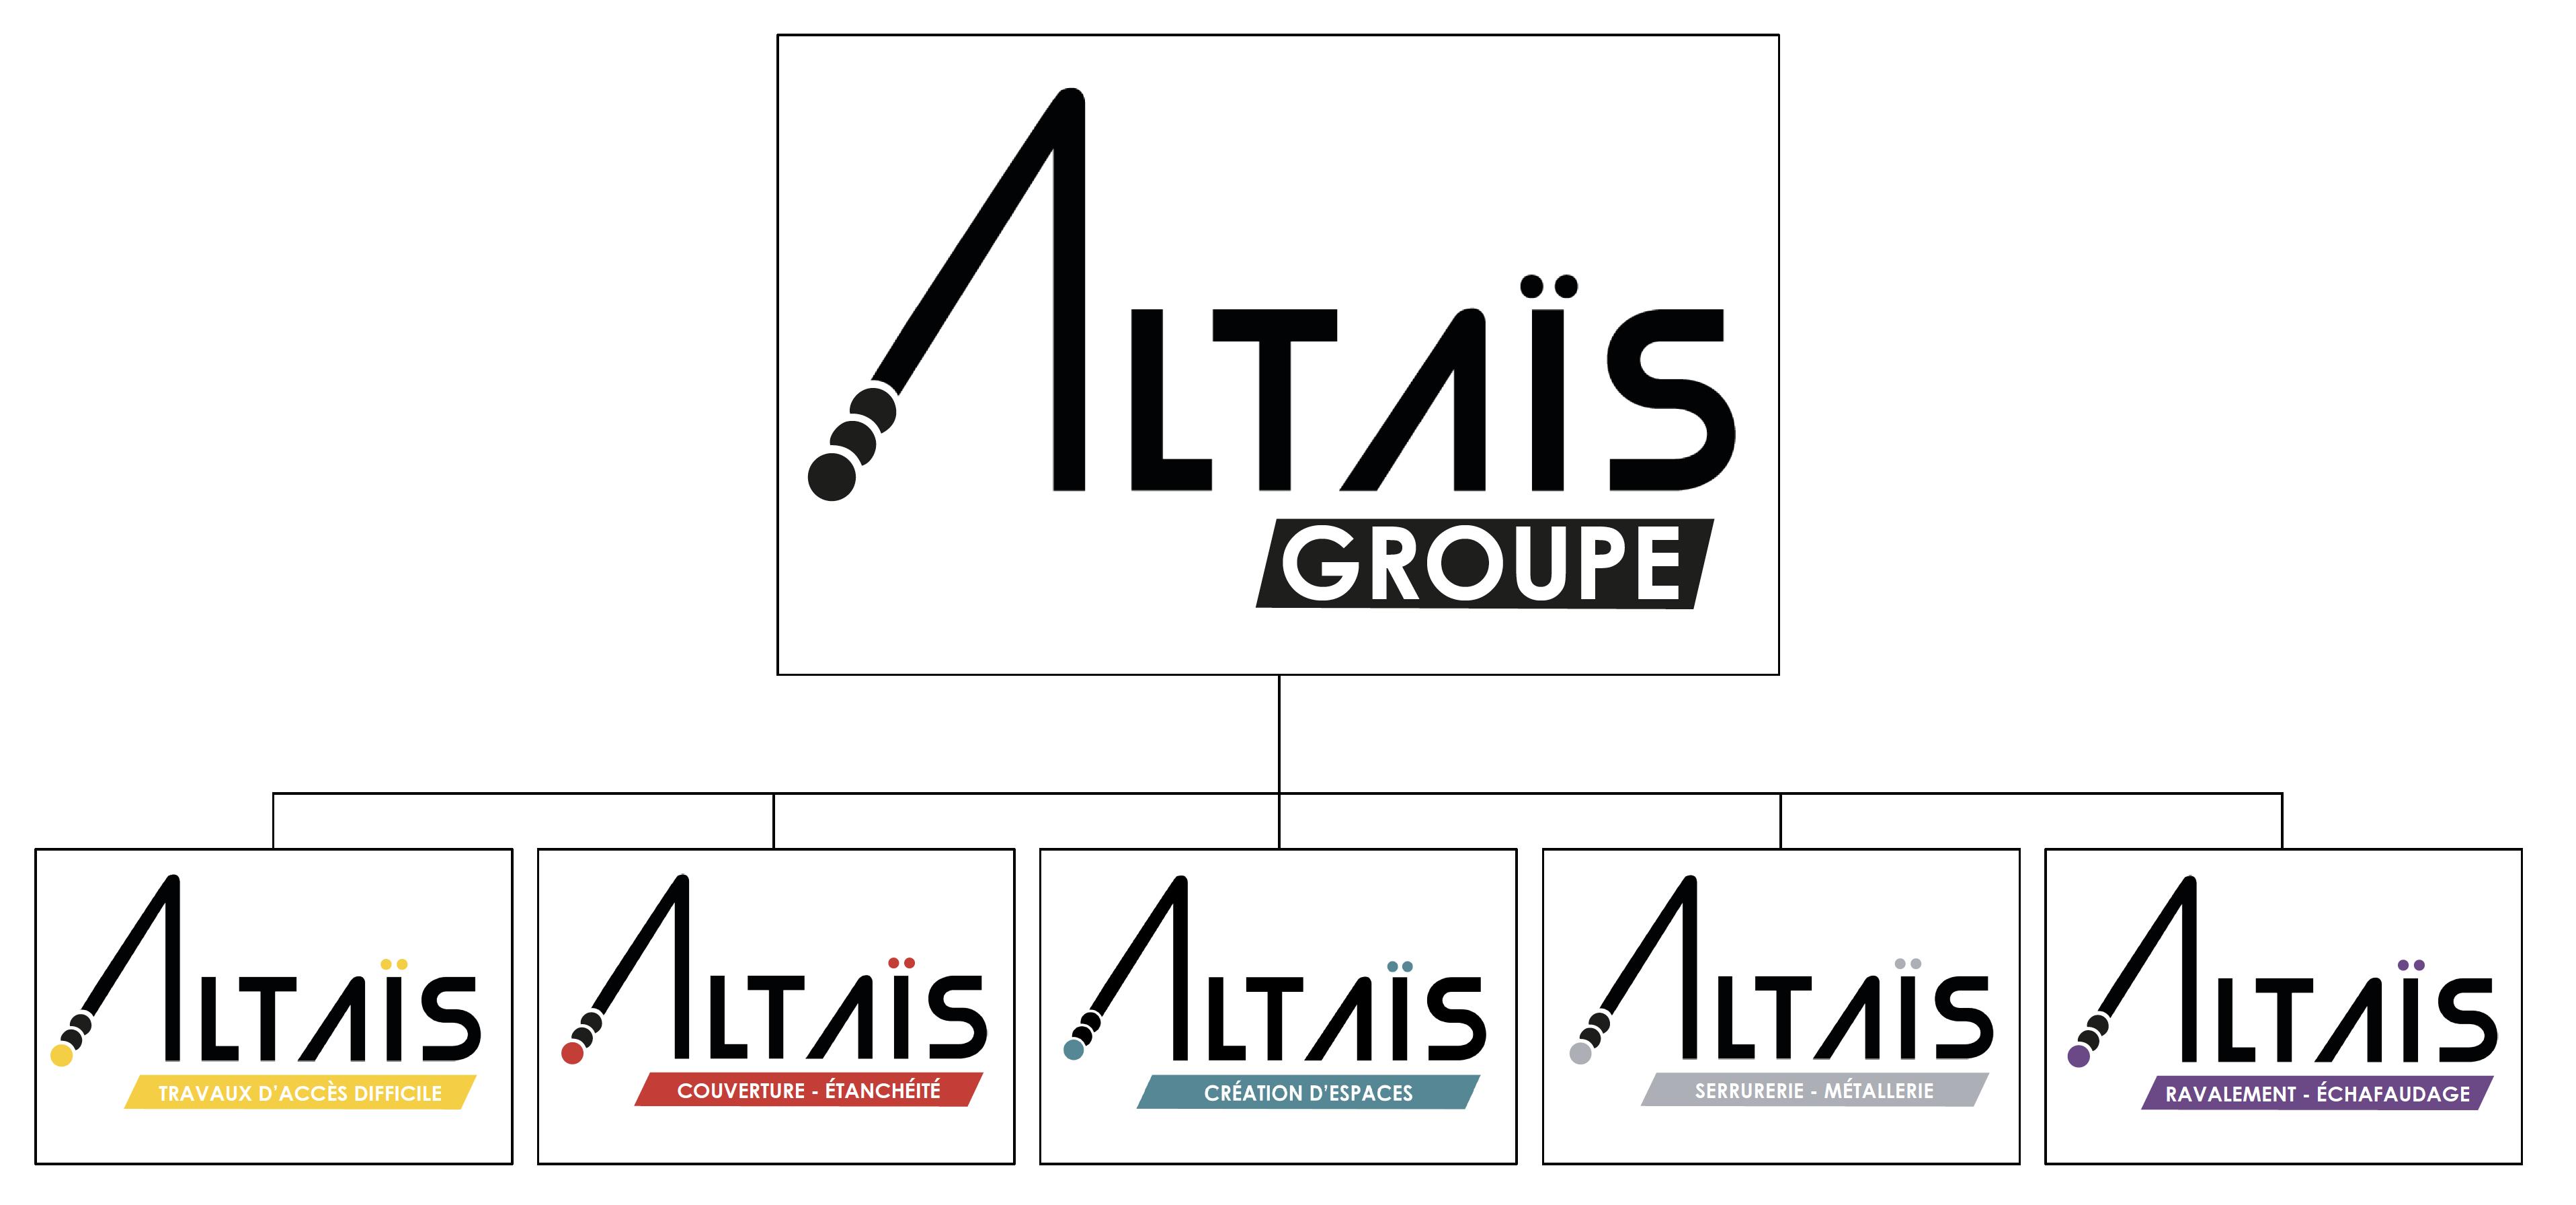 structure-groupe-altais